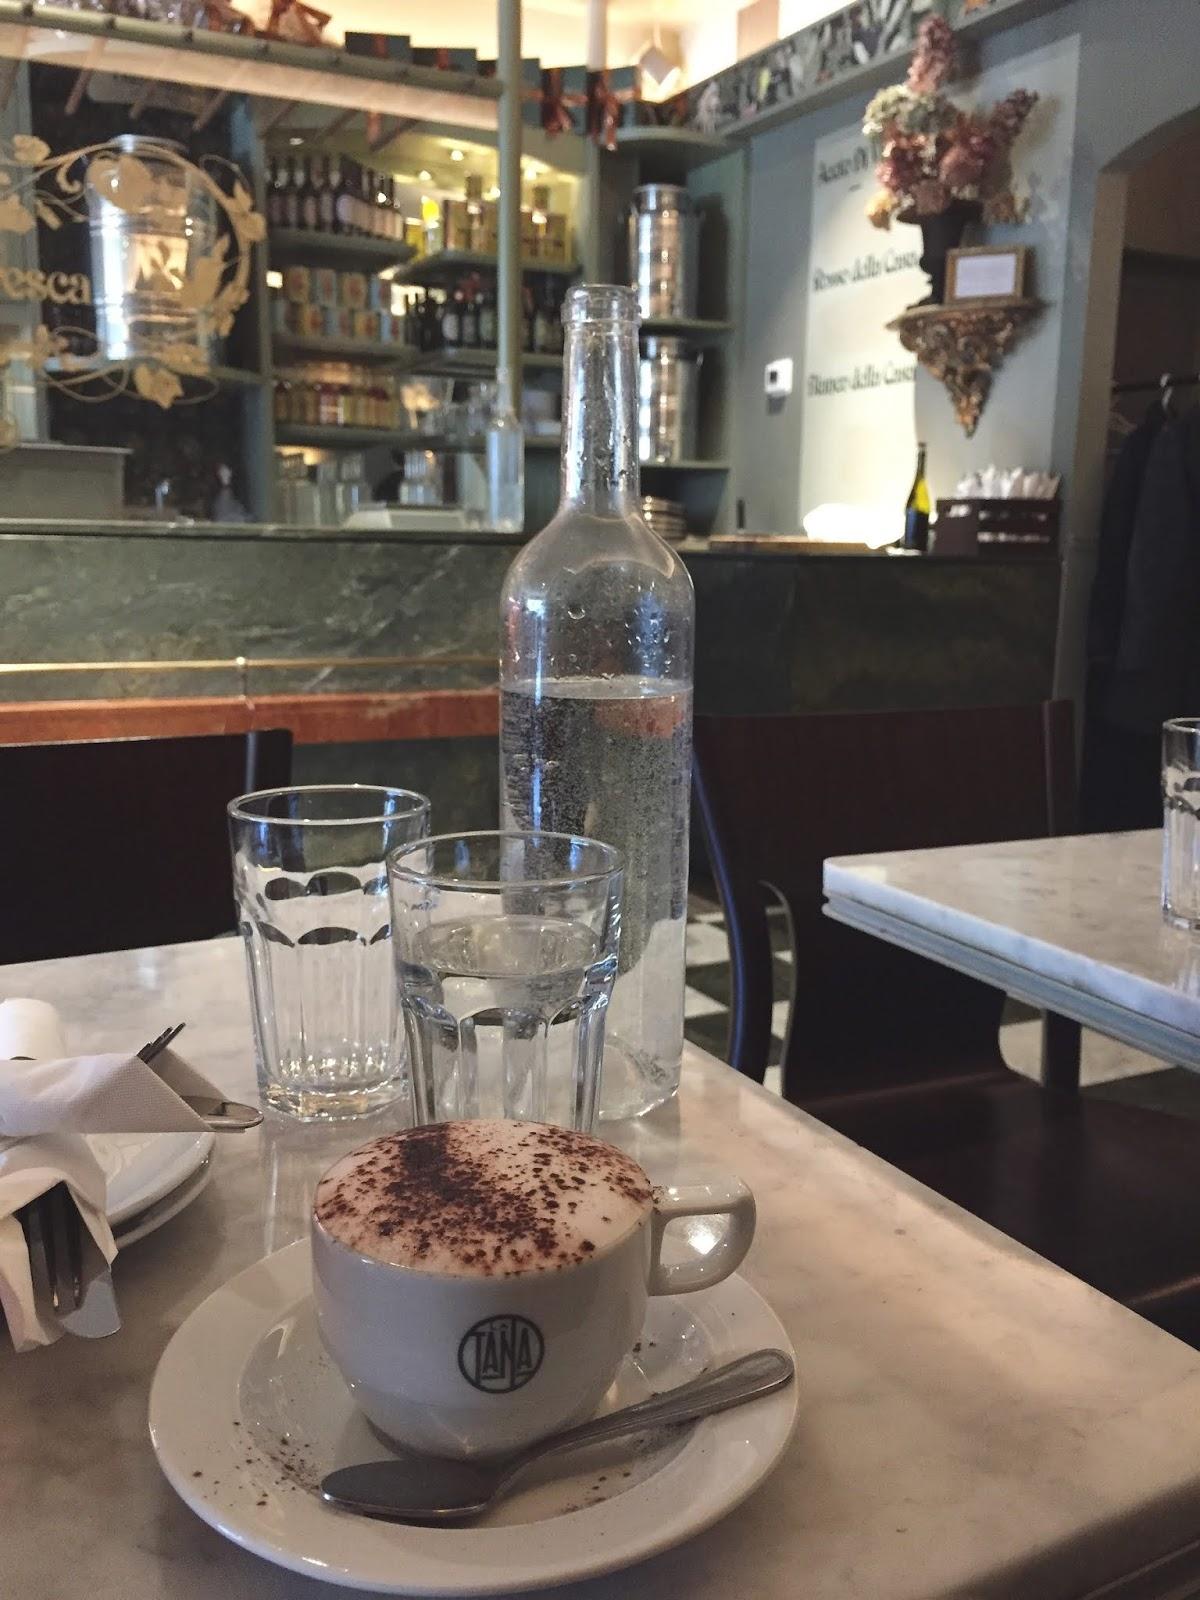 Caffe La Tana Vancouver